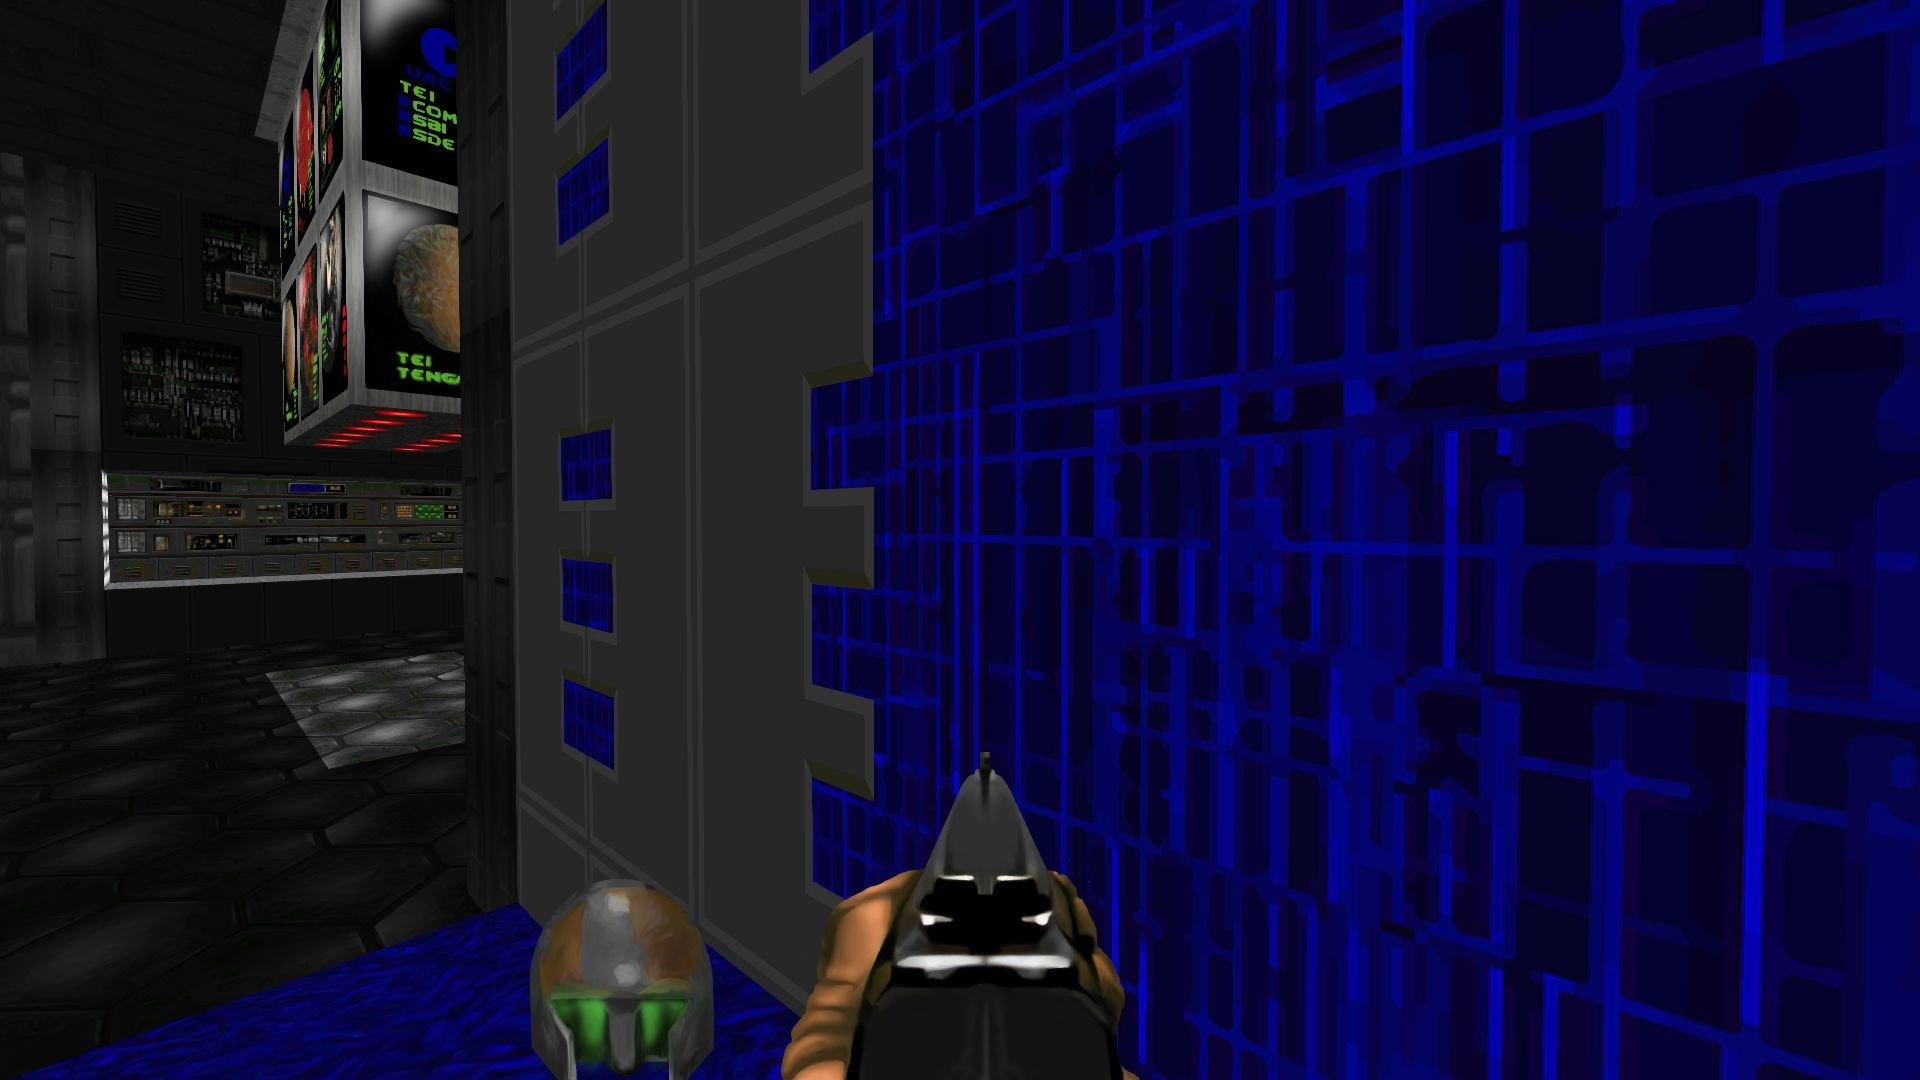 Screenshot_Doom_20181021_233136.jpg.4756c354ec6ad8dc52daf119180e7bf8.jpg